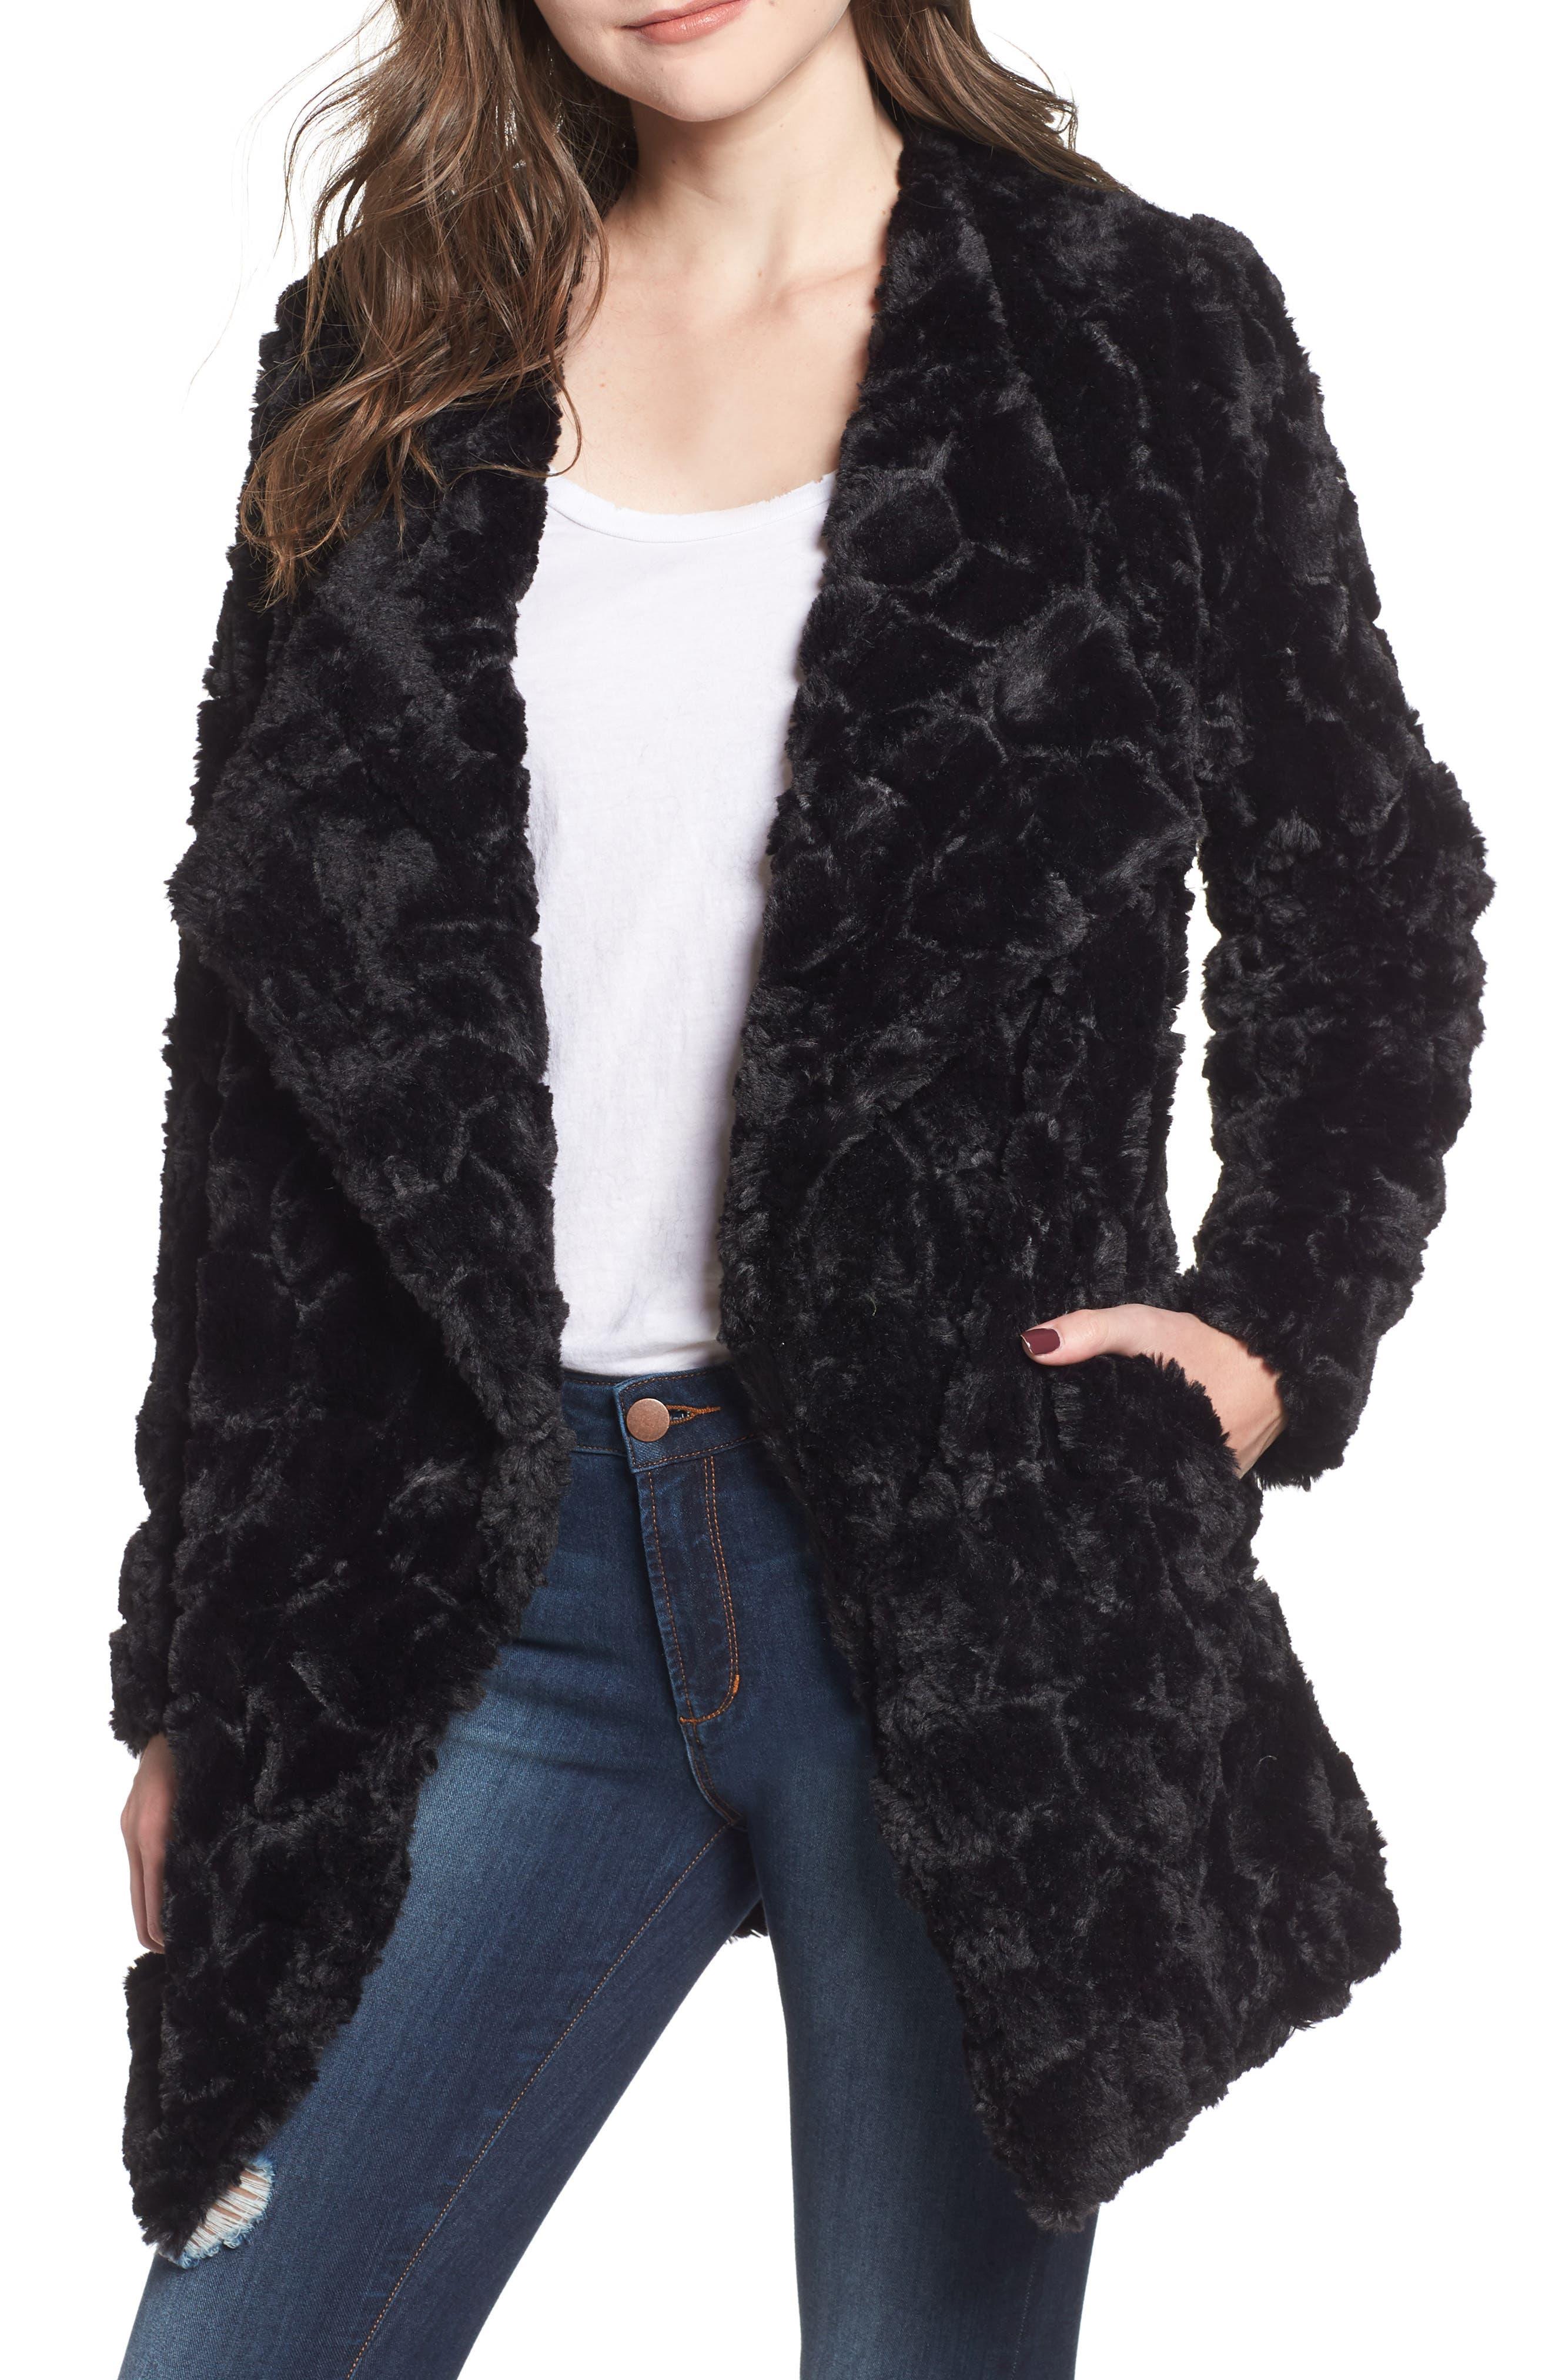 Tucker Wubby Faux Fur Coat,                             Main thumbnail 1, color,                             001